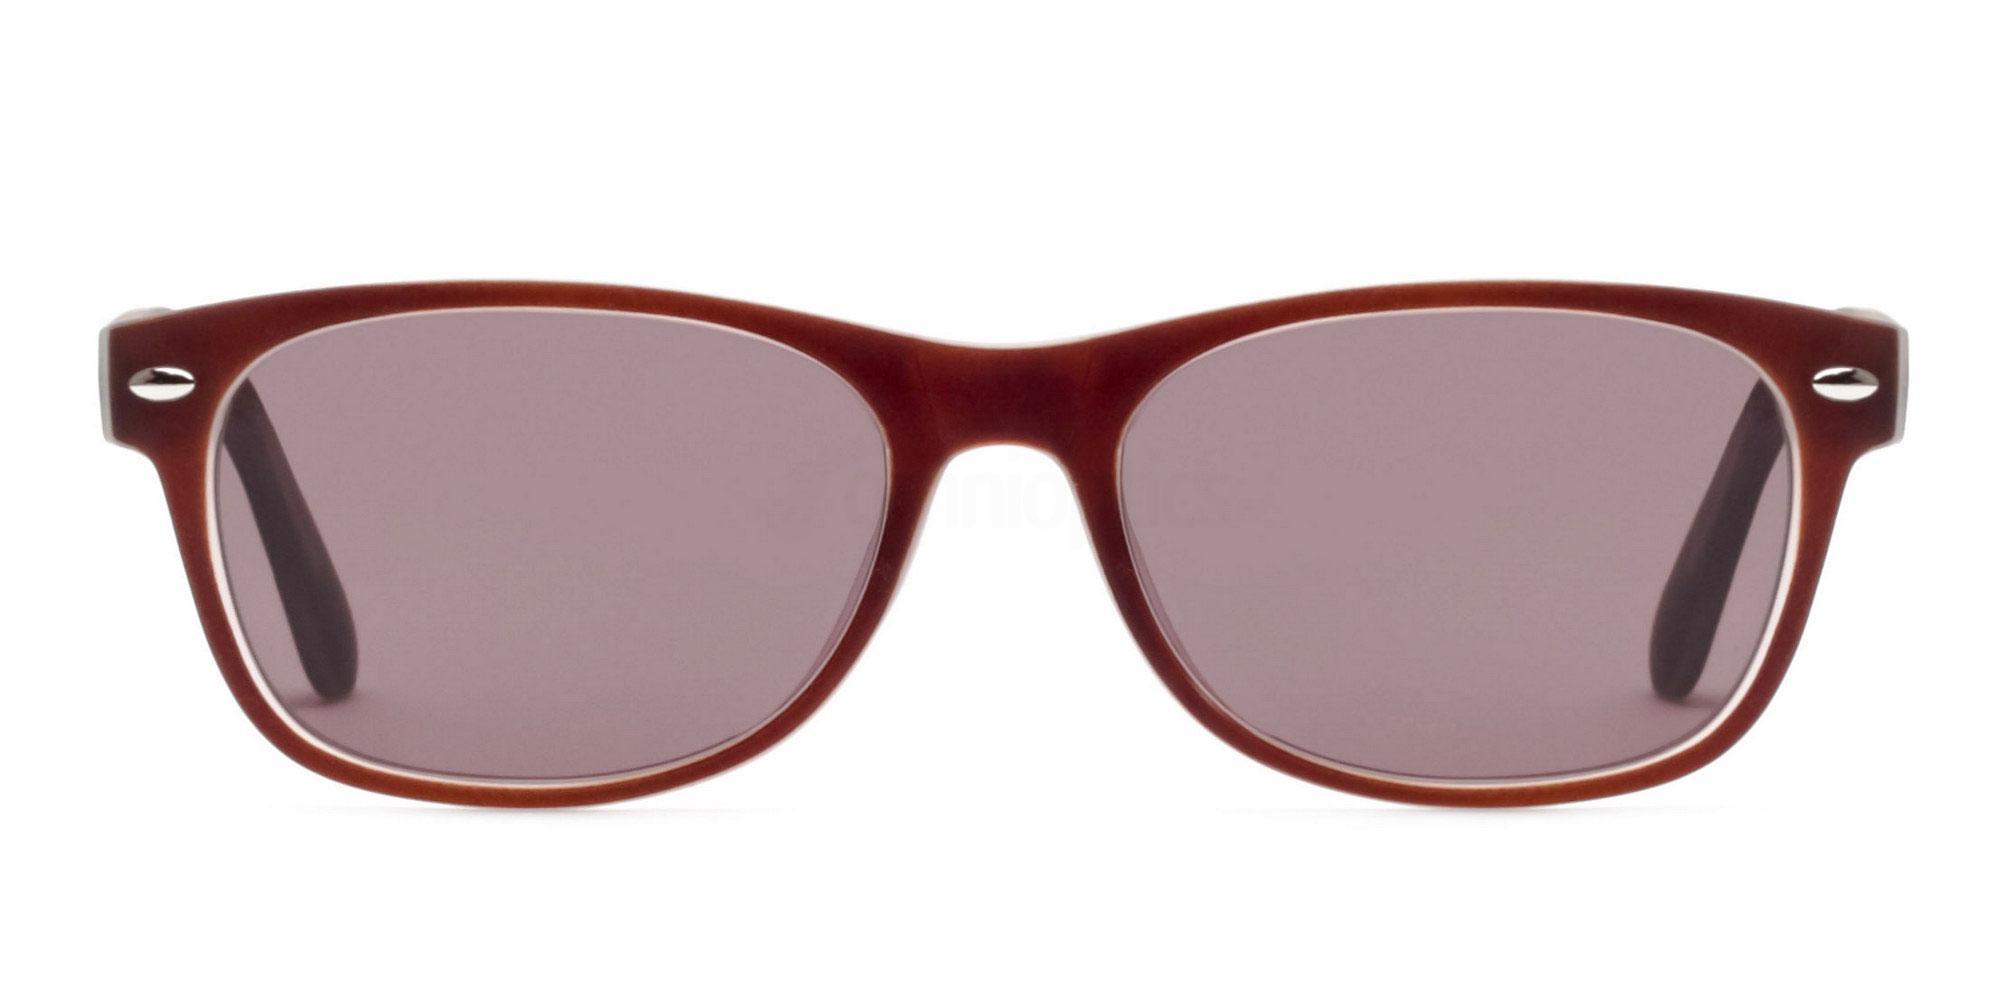 Brown S8122 - Brown (Sunglasses) Sunglasses, Savannah